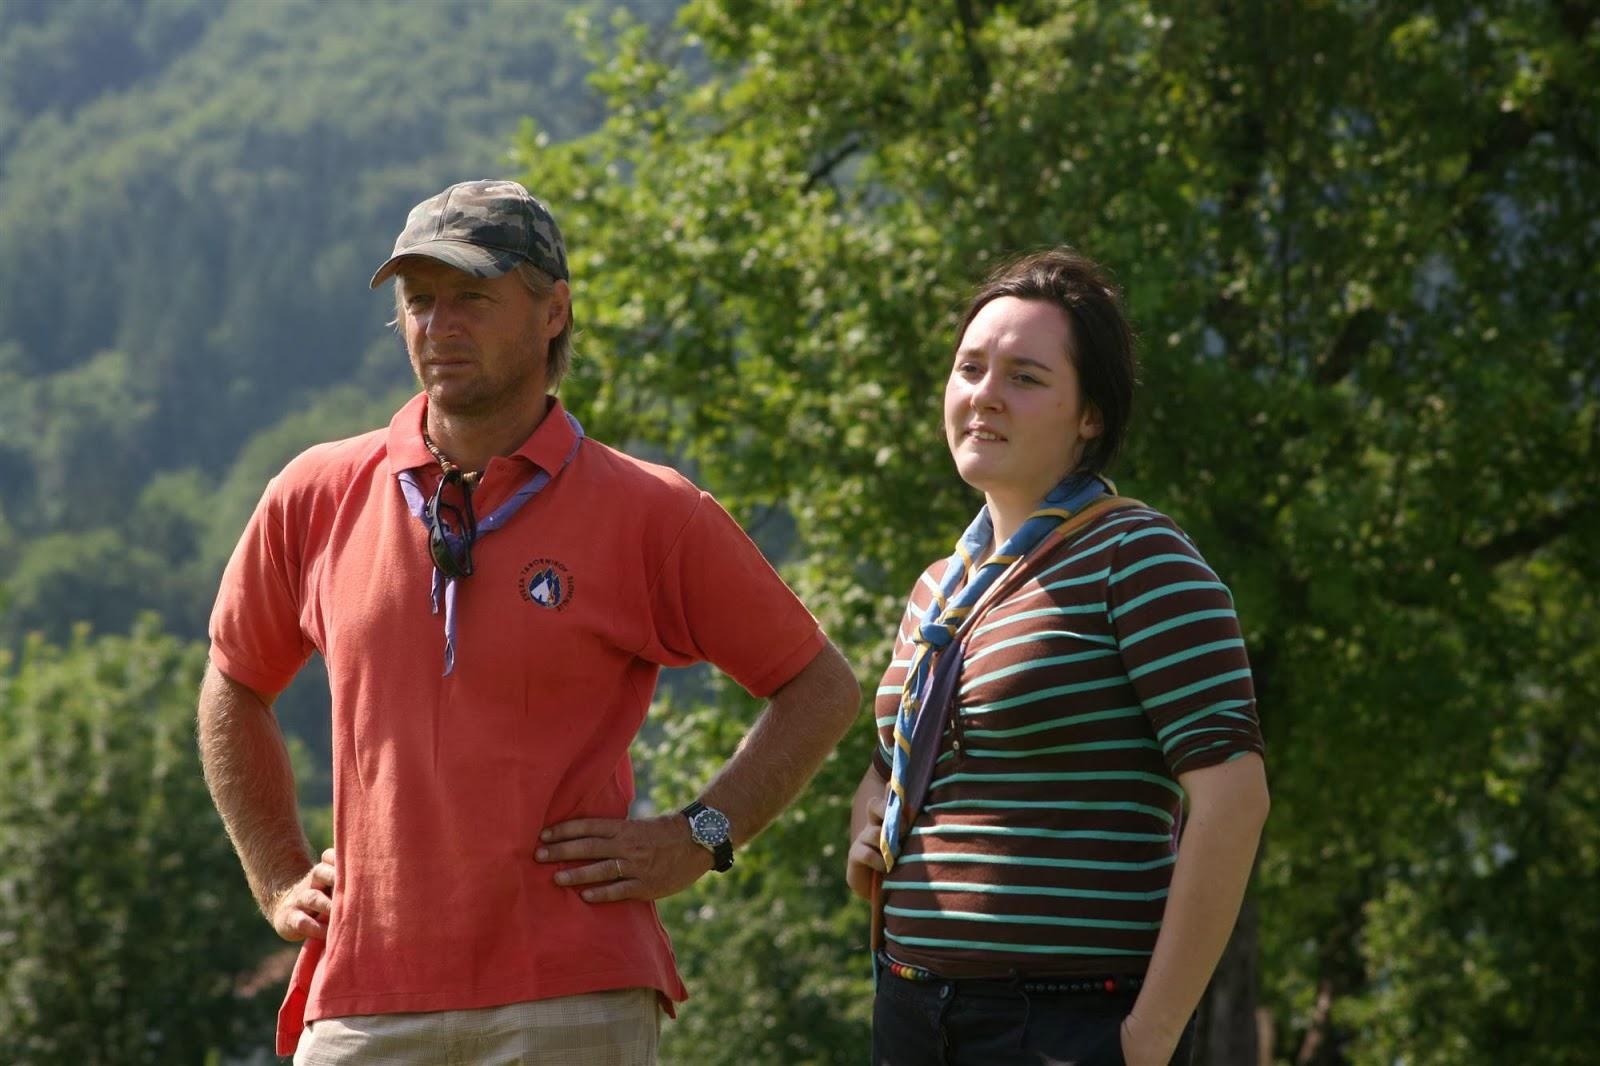 Državni mnogoboj, Velenje 2007 - IMG_8771.jpg